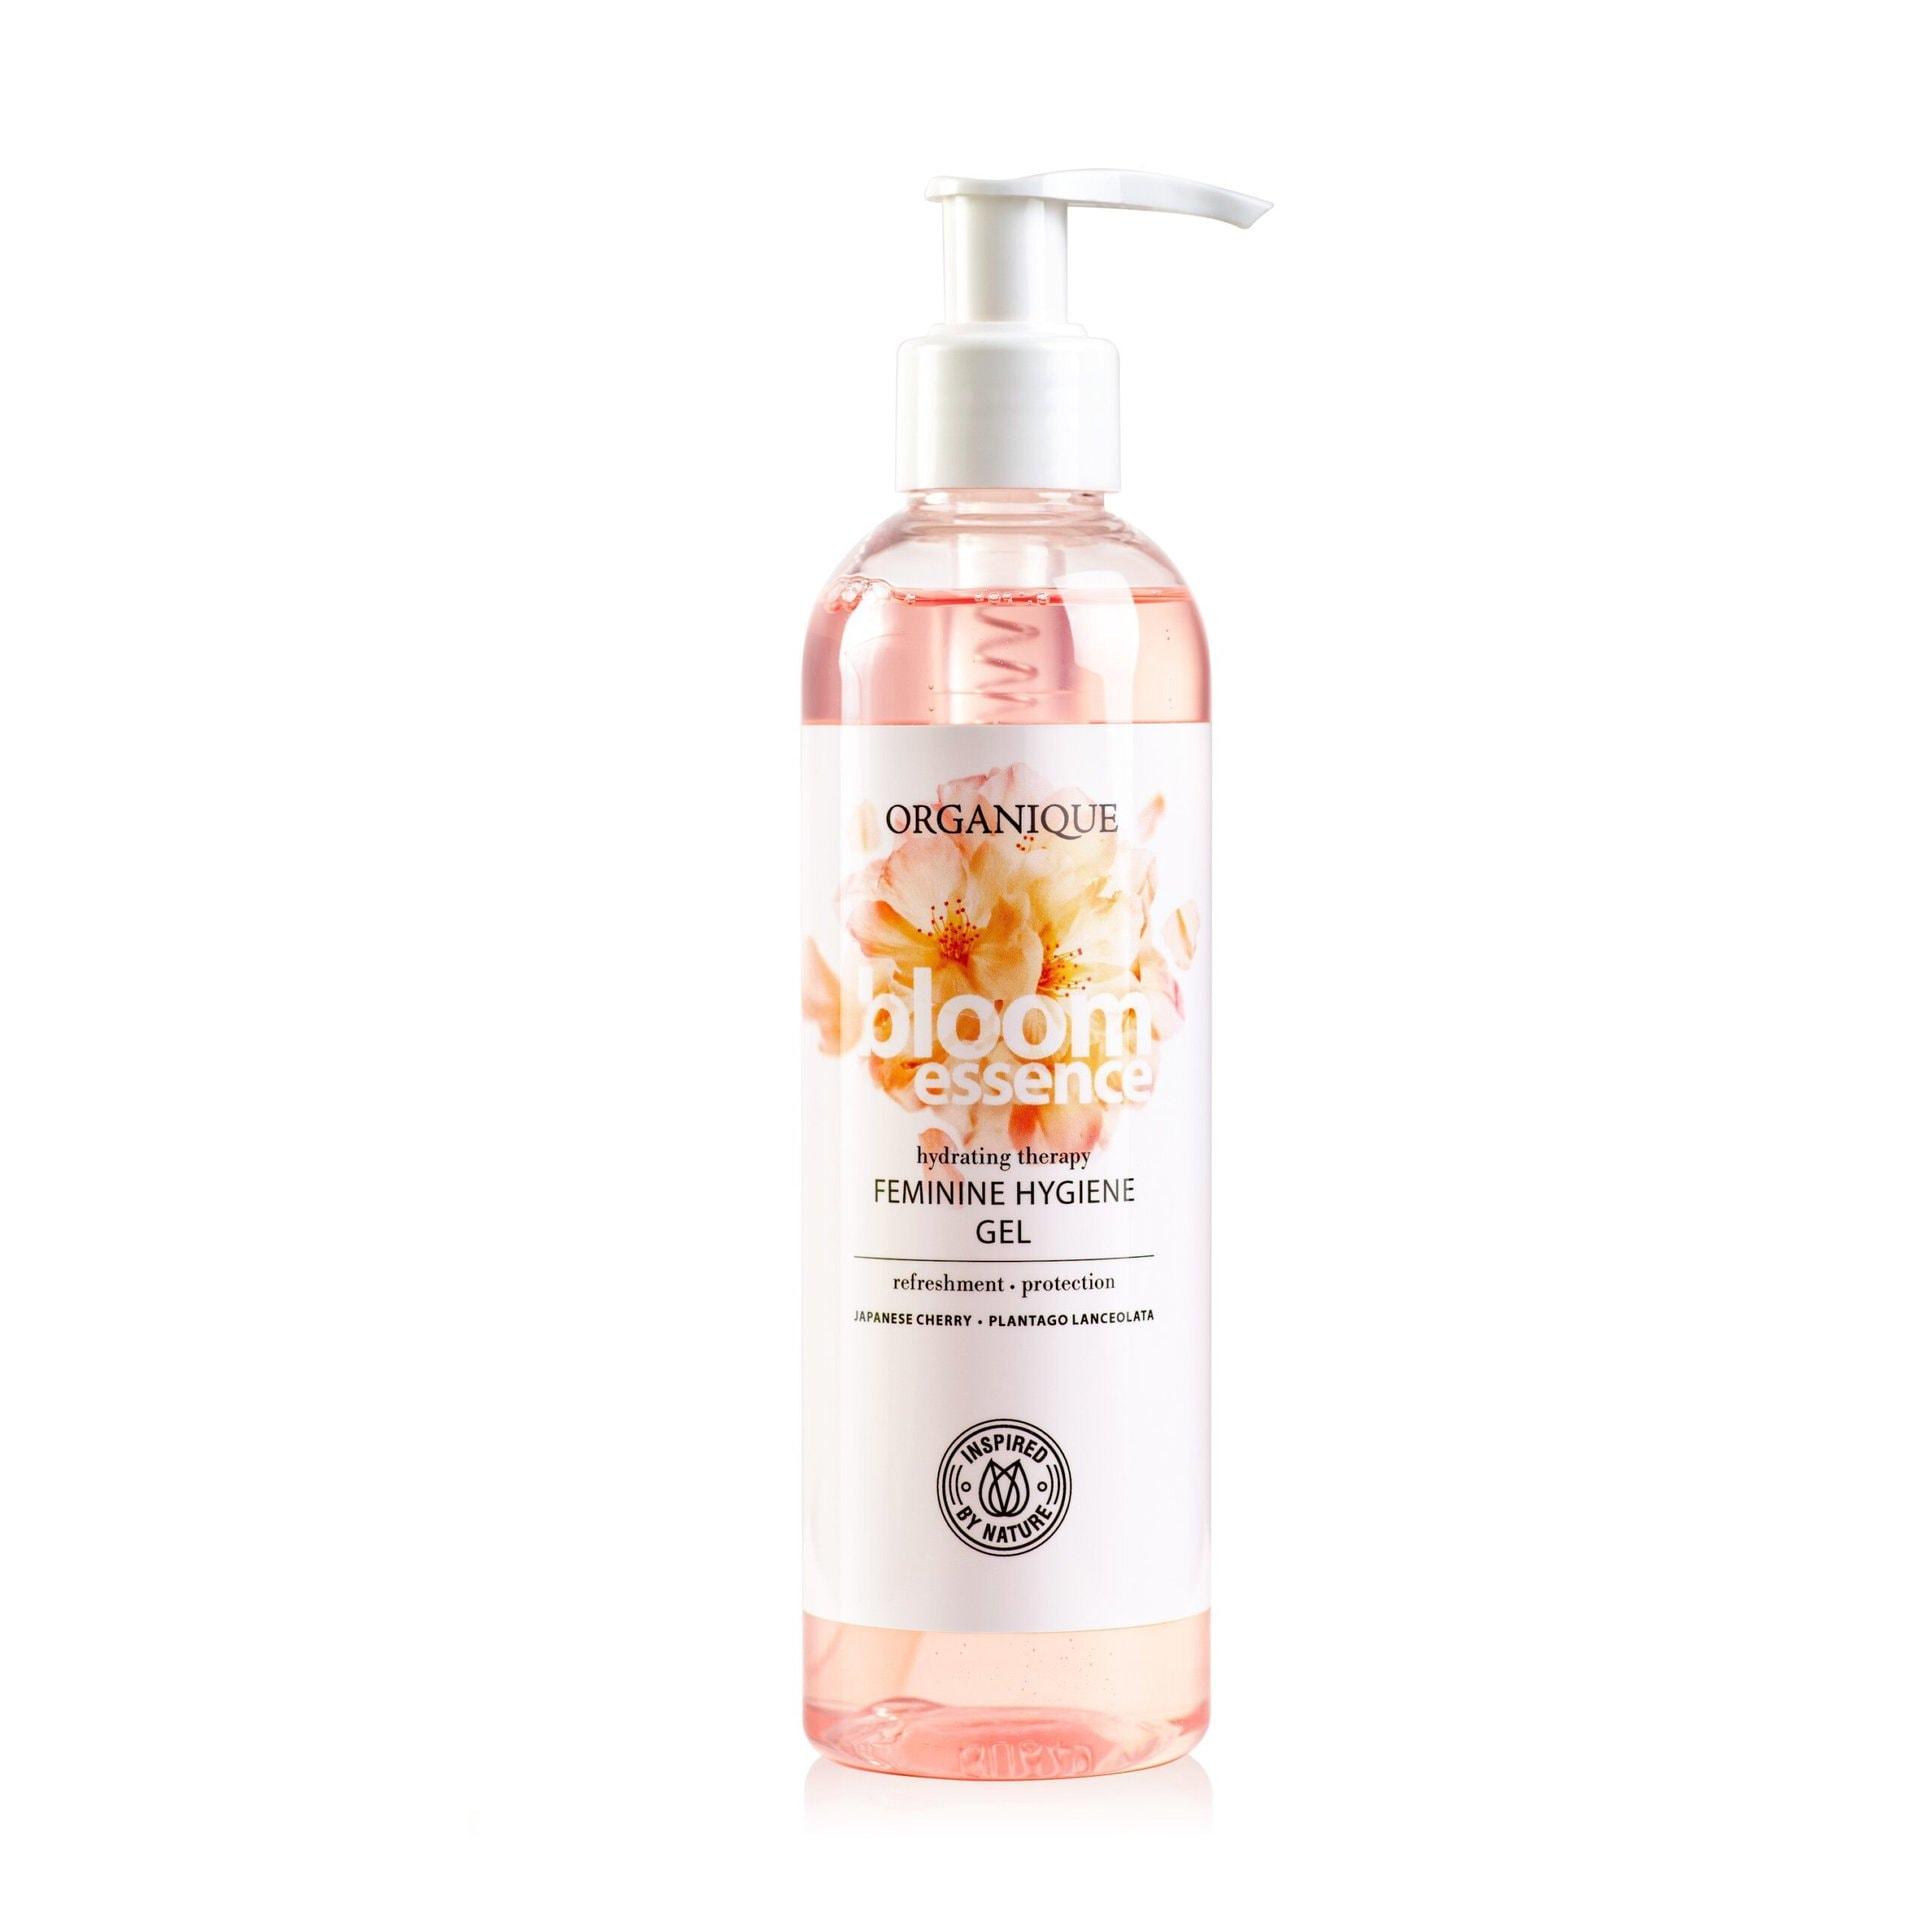 bloom-essence-intim-tusfurdo-gel-250-ml